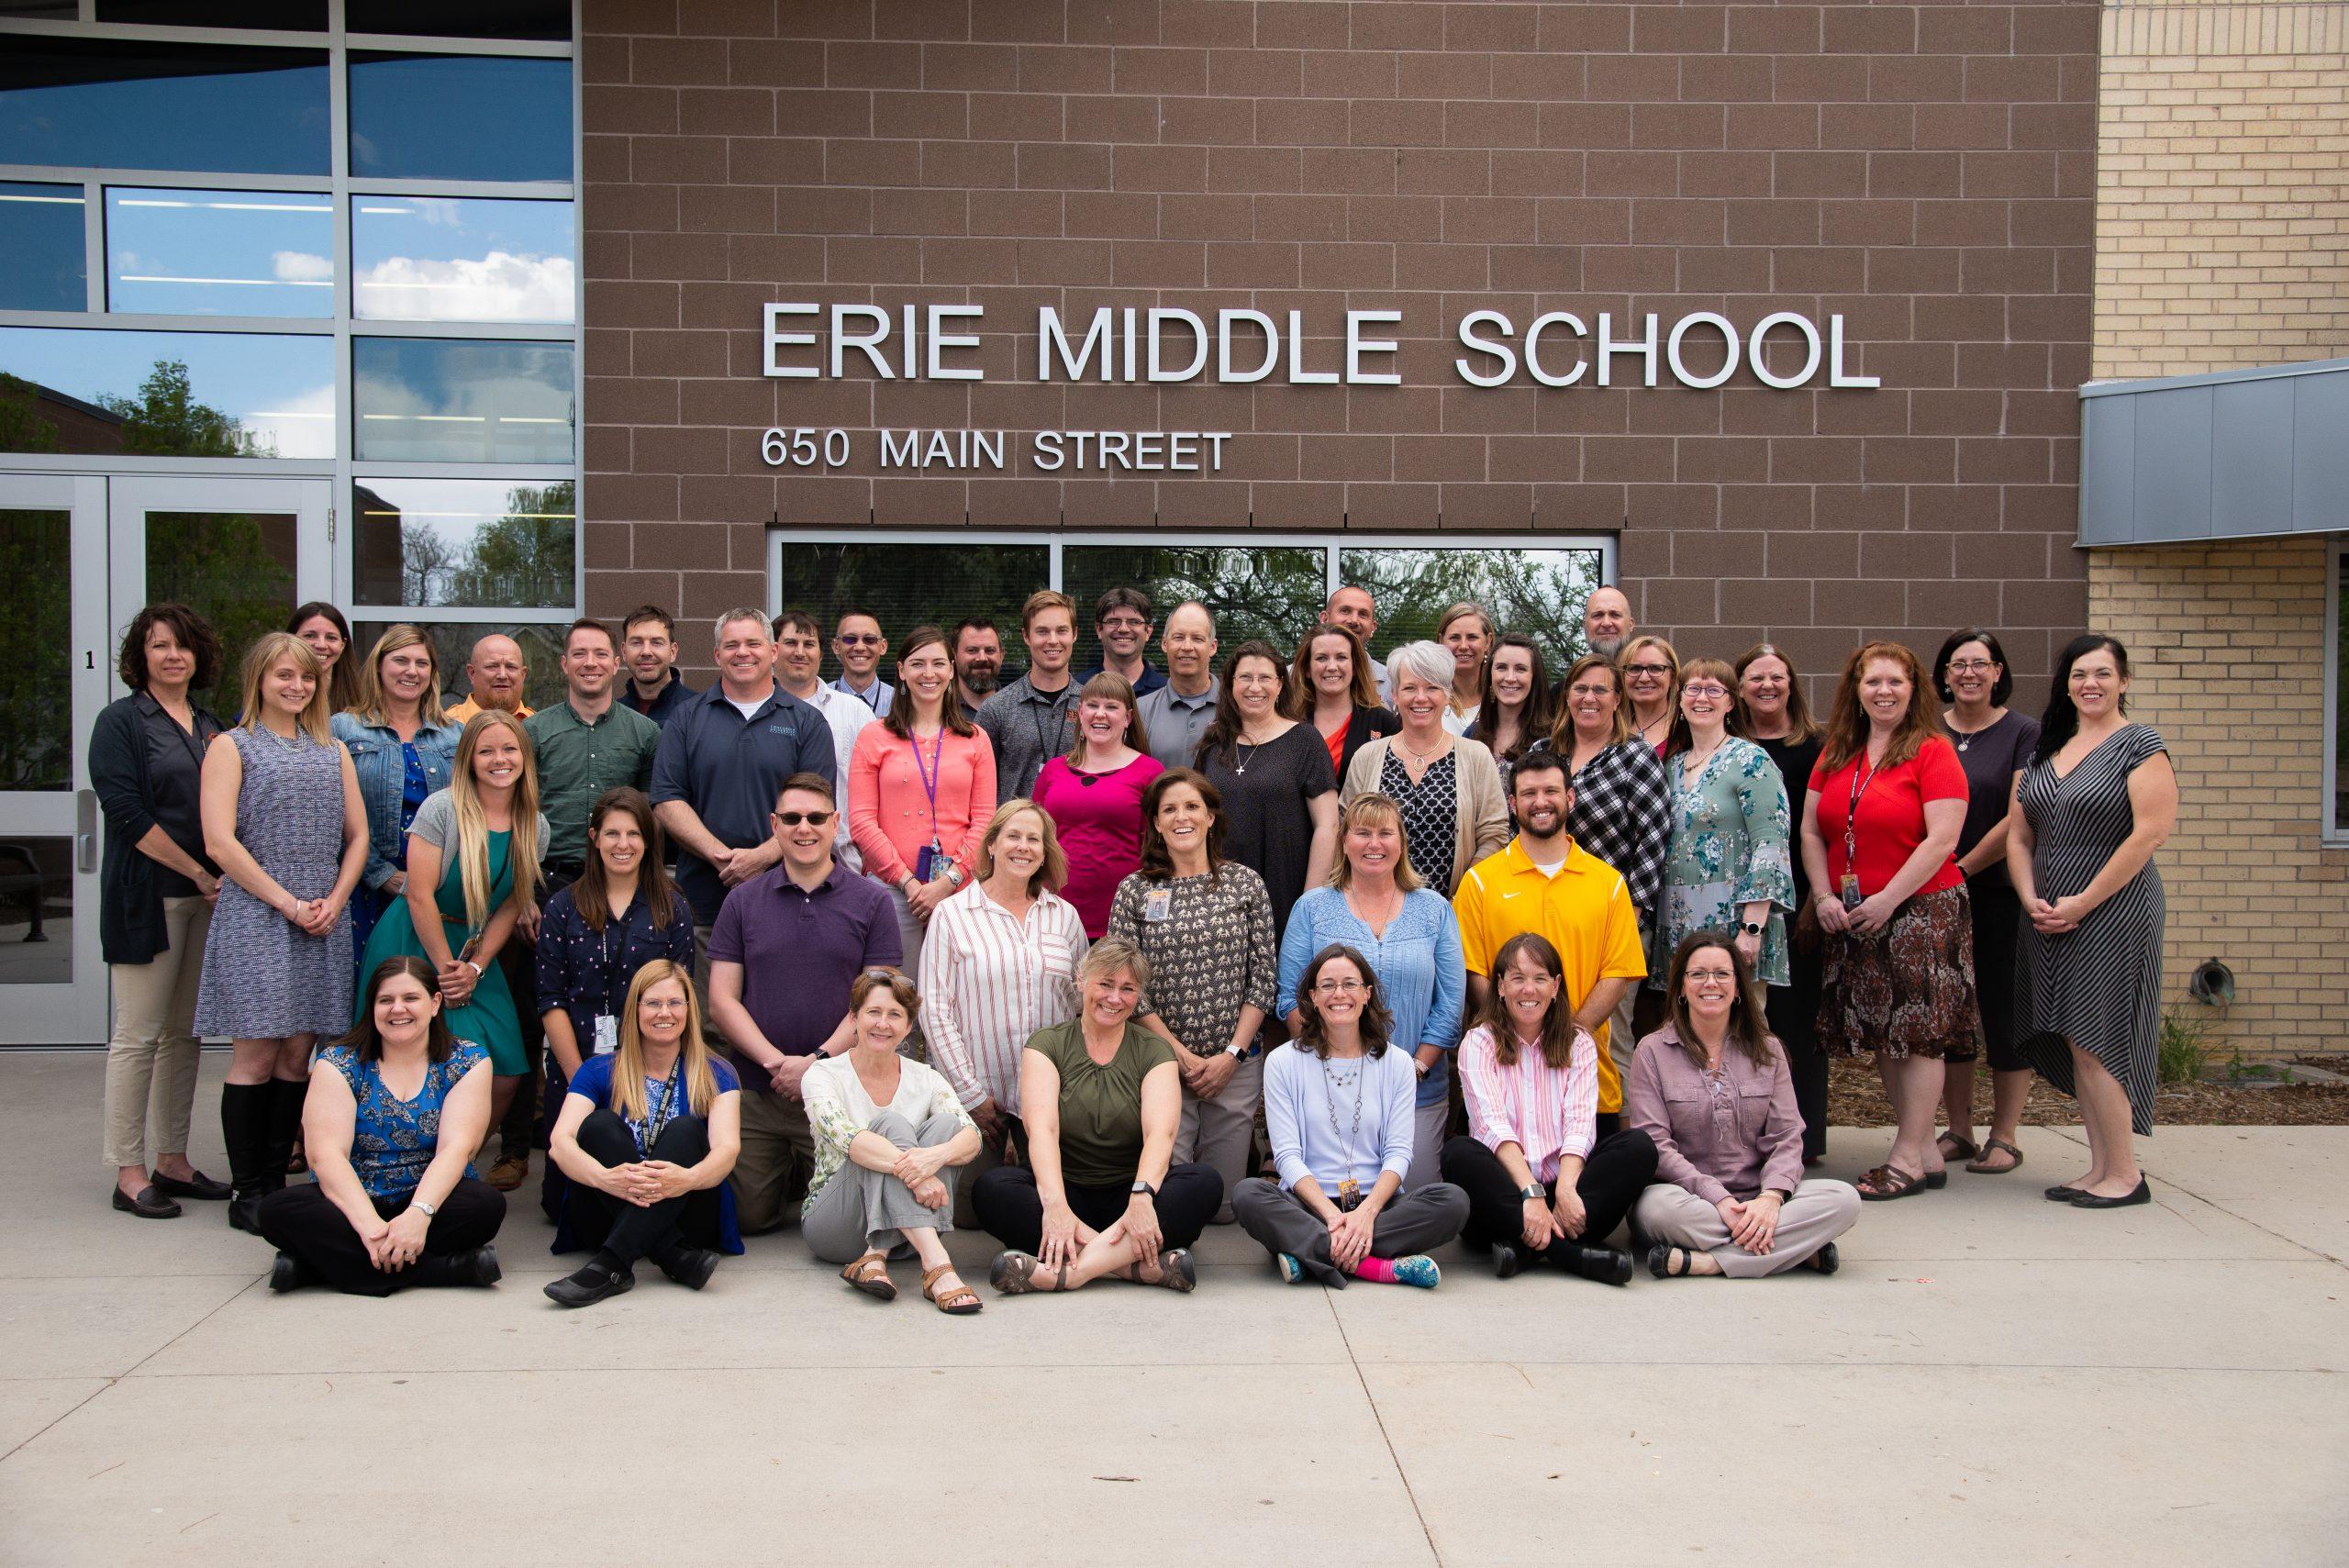 Erie Middle School Staff